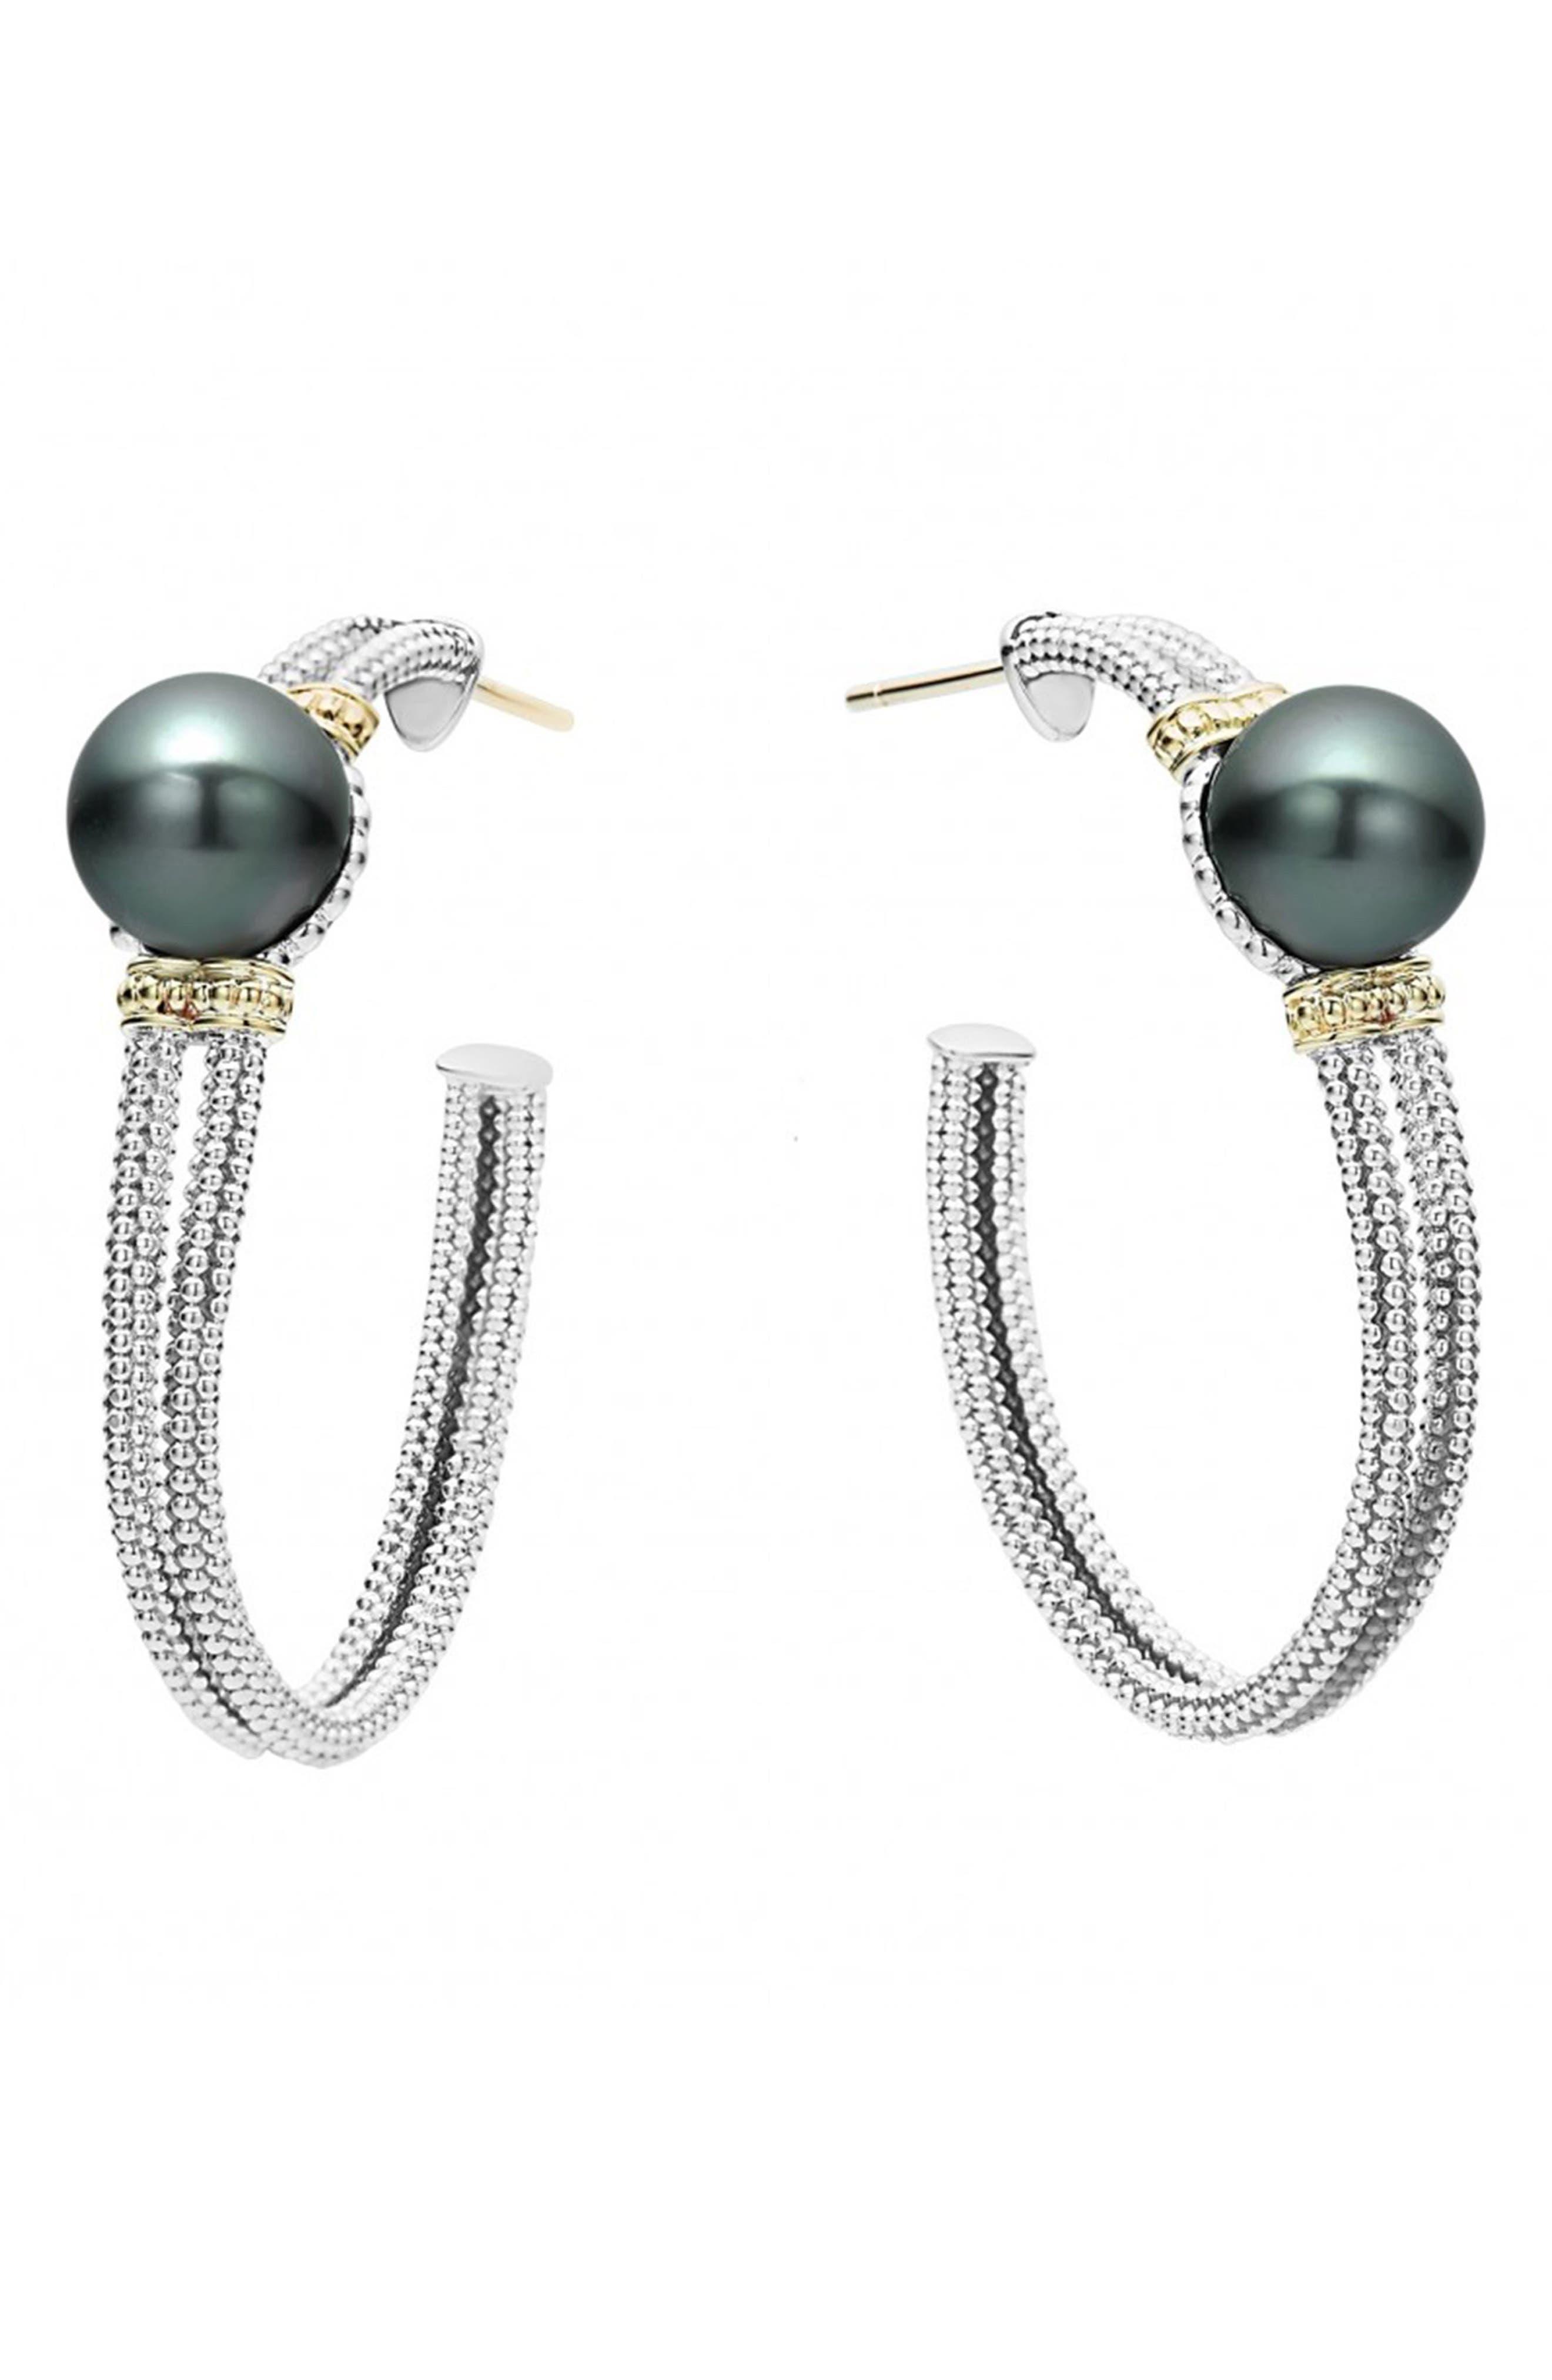 Luna 10mm Pearl Hoop Earrings,                             Main thumbnail 1, color,                             Black Pearl